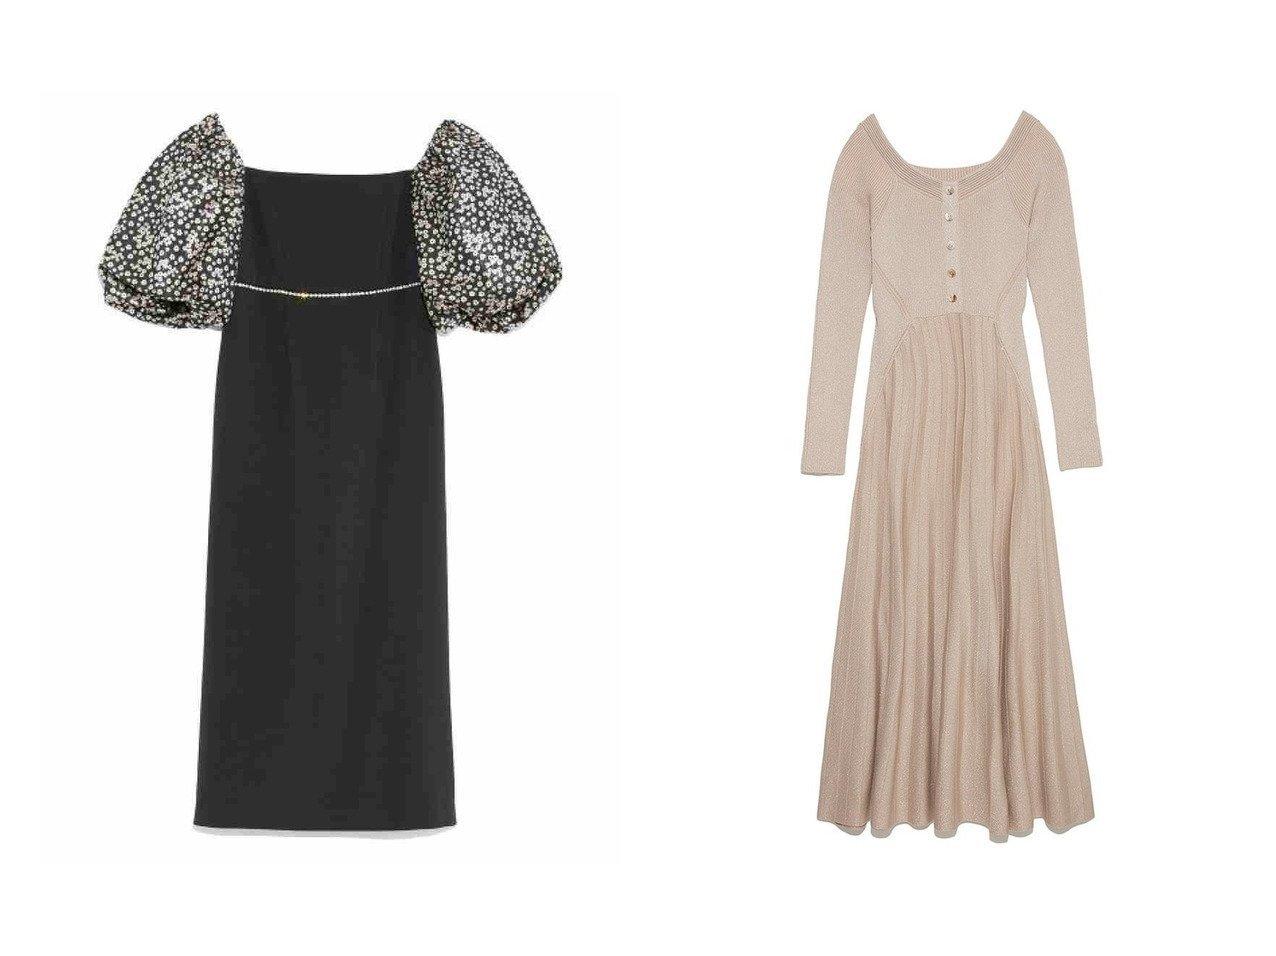 【Lily Brown/リリーブラウン】のラメニットワンピース&[L.B CANDY STOCK]ビジューチェーンワンピース ワンピース・ドレスのおすすめ!人気、トレンド・レディースファッションの通販  おすすめで人気の流行・トレンド、ファッションの通販商品 メンズファッション・キッズファッション・インテリア・家具・レディースファッション・服の通販 founy(ファニー) https://founy.com/ ファッション Fashion レディースファッション WOMEN ワンピース Dress マキシワンピース Maxi Dress ニットワンピース Knit Dresses オフショルダー シンプル スリーブ ドレス ビジュー マキシ ミニスカート ロング 定番 |ID:crp329100000010196